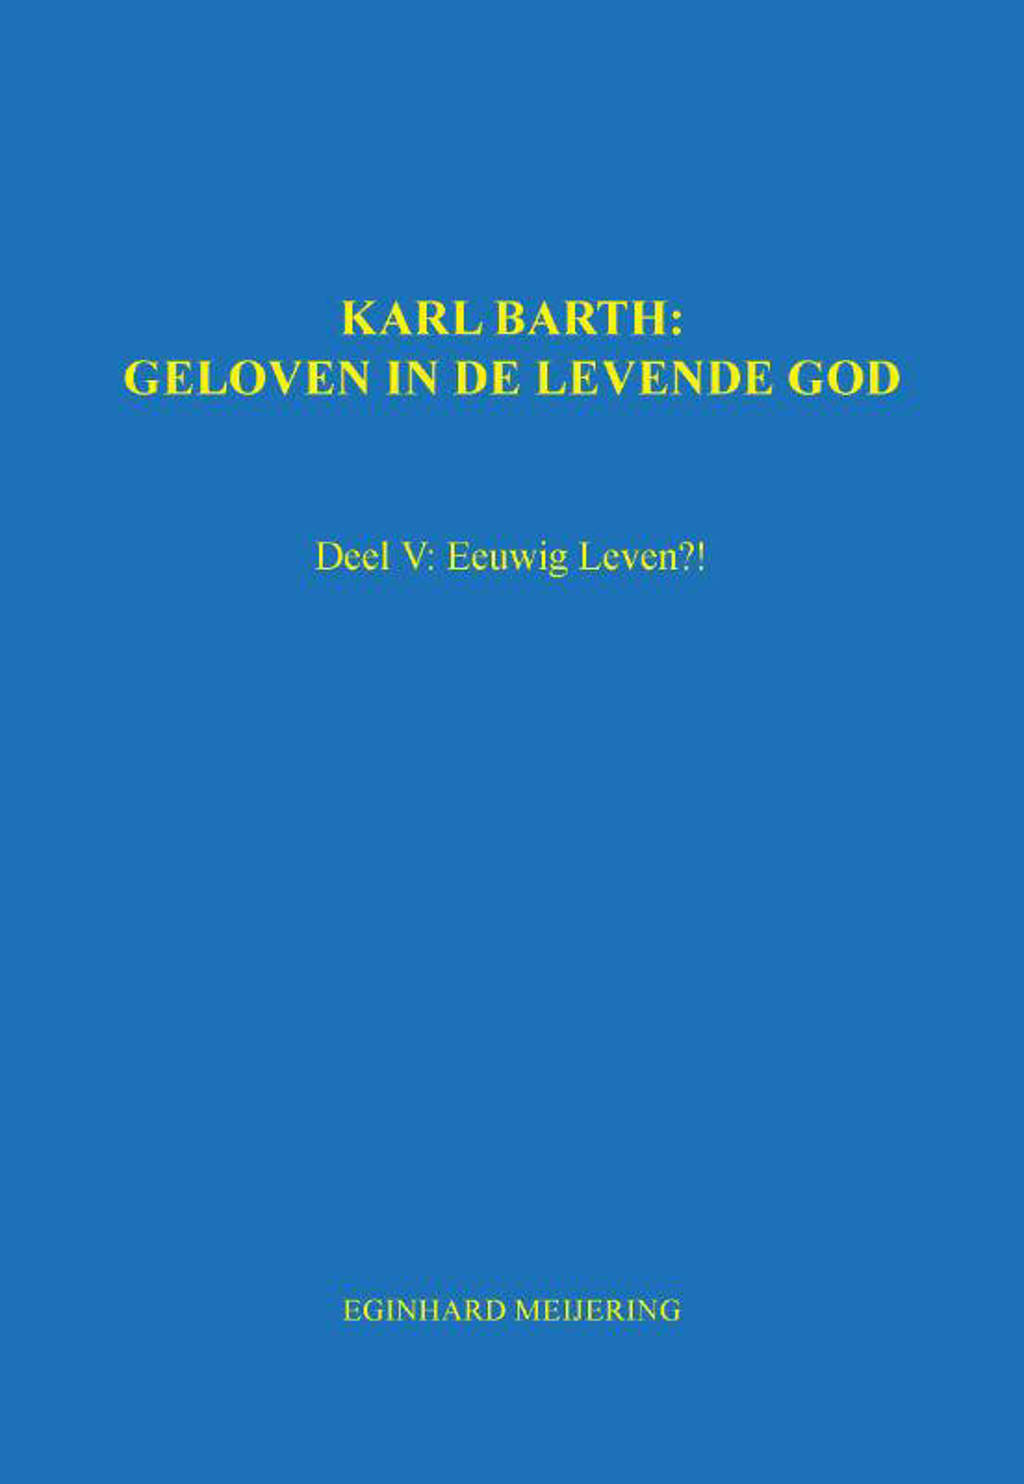 Karl Barth: Geloven in de levende god 5 - E.P. Meijering